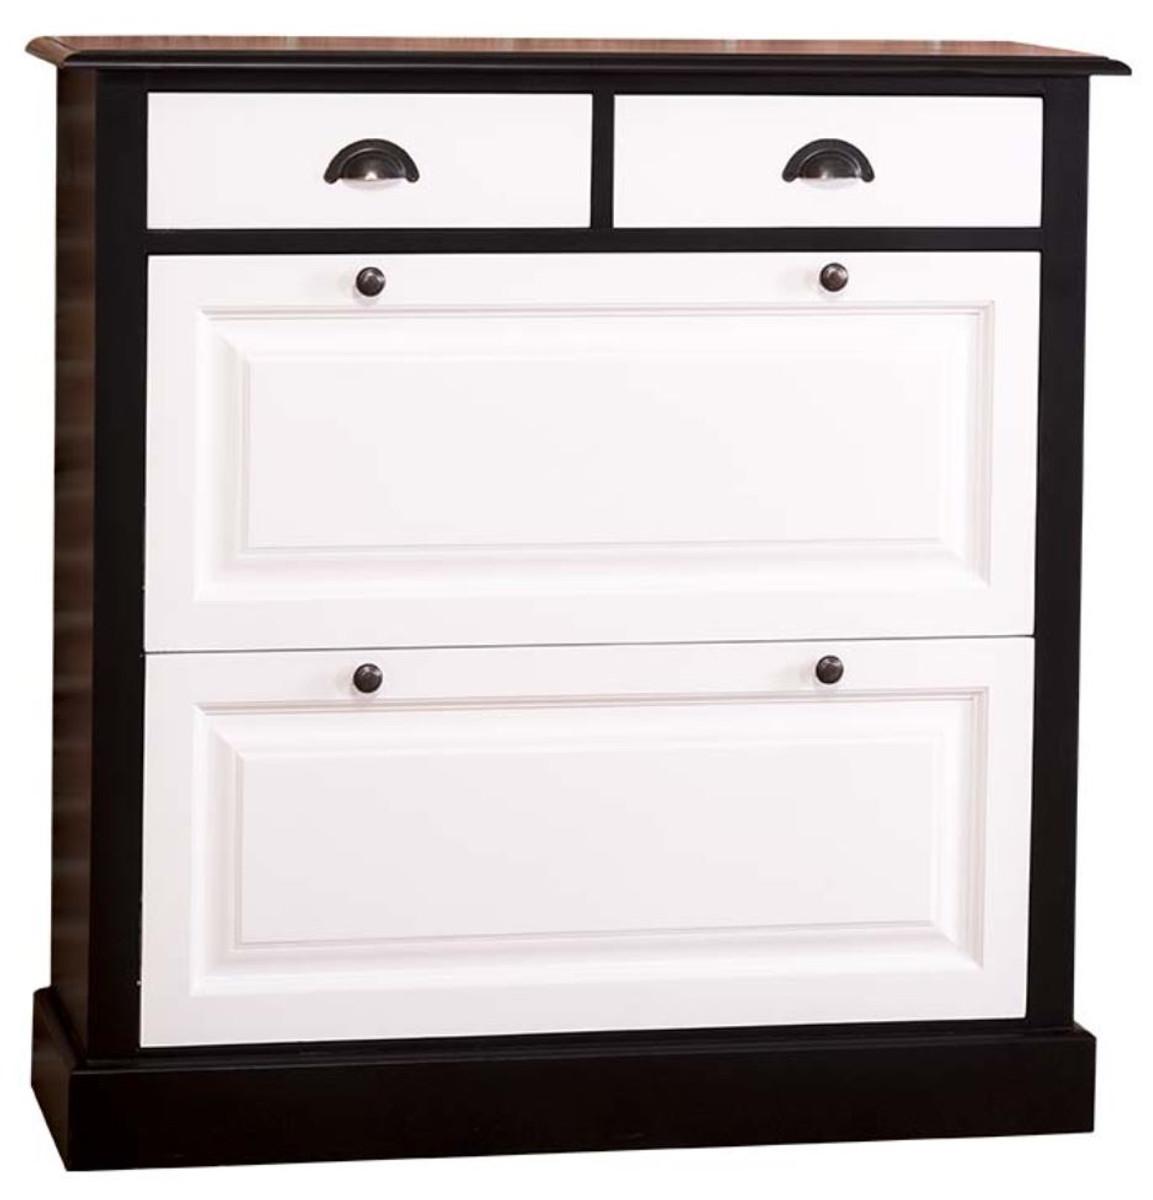 casa padrino armoire a chaussures de style country noir blanc 103 x 35 x h 105 cm meubles de style country